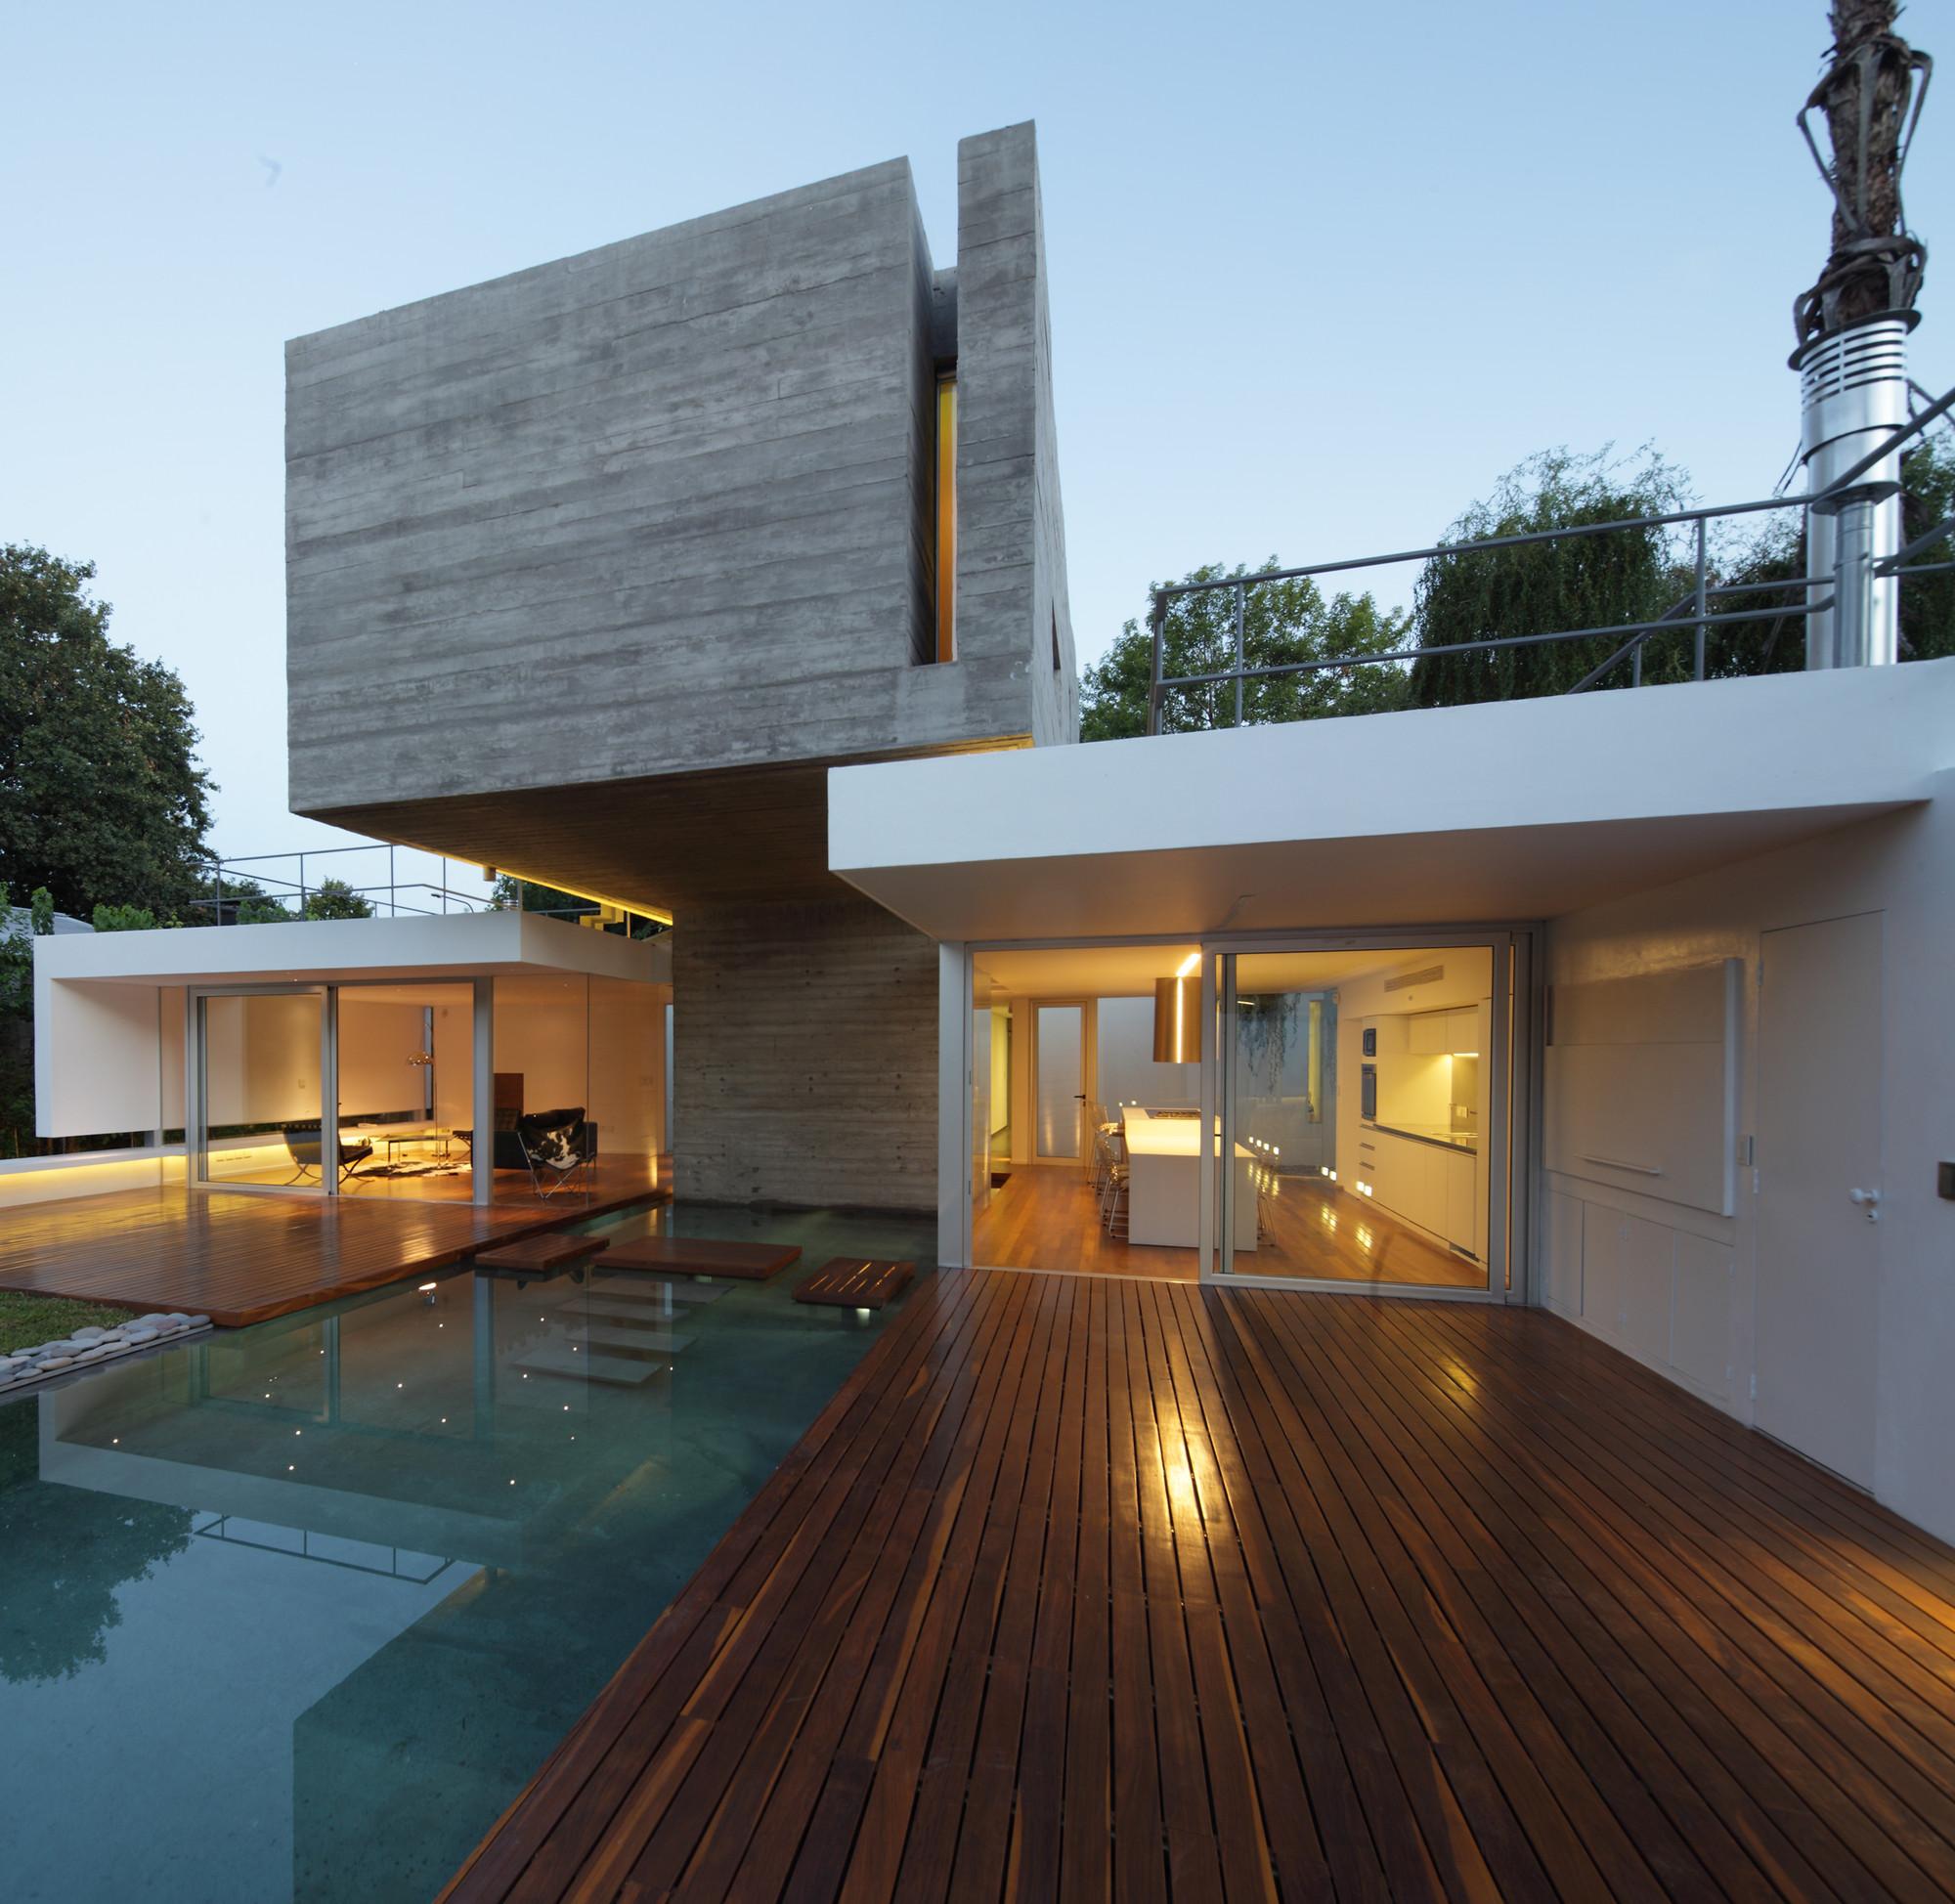 Bunker house estudio botteri connell archdaily for Arredamento interno casa moderna